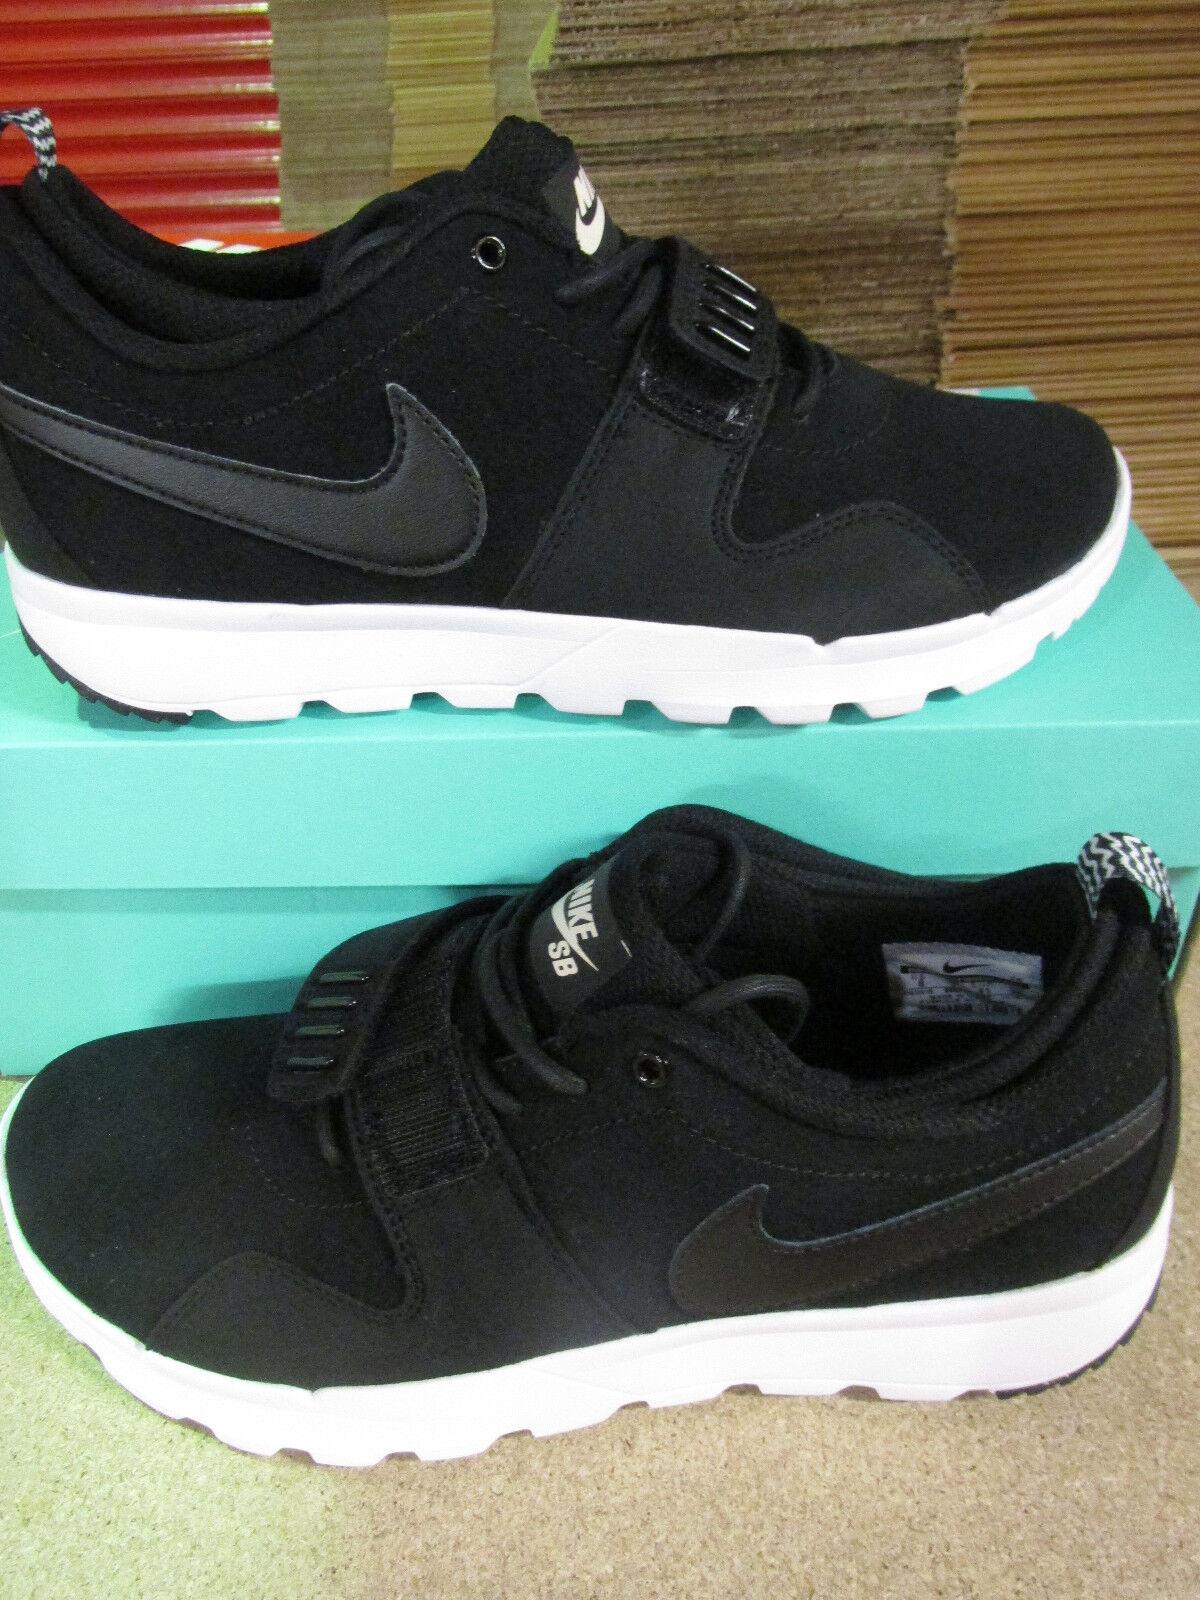 Nike SB TRAINERENDOR L  Uomo Scarpe Scarpe da ginnastica 806309 002